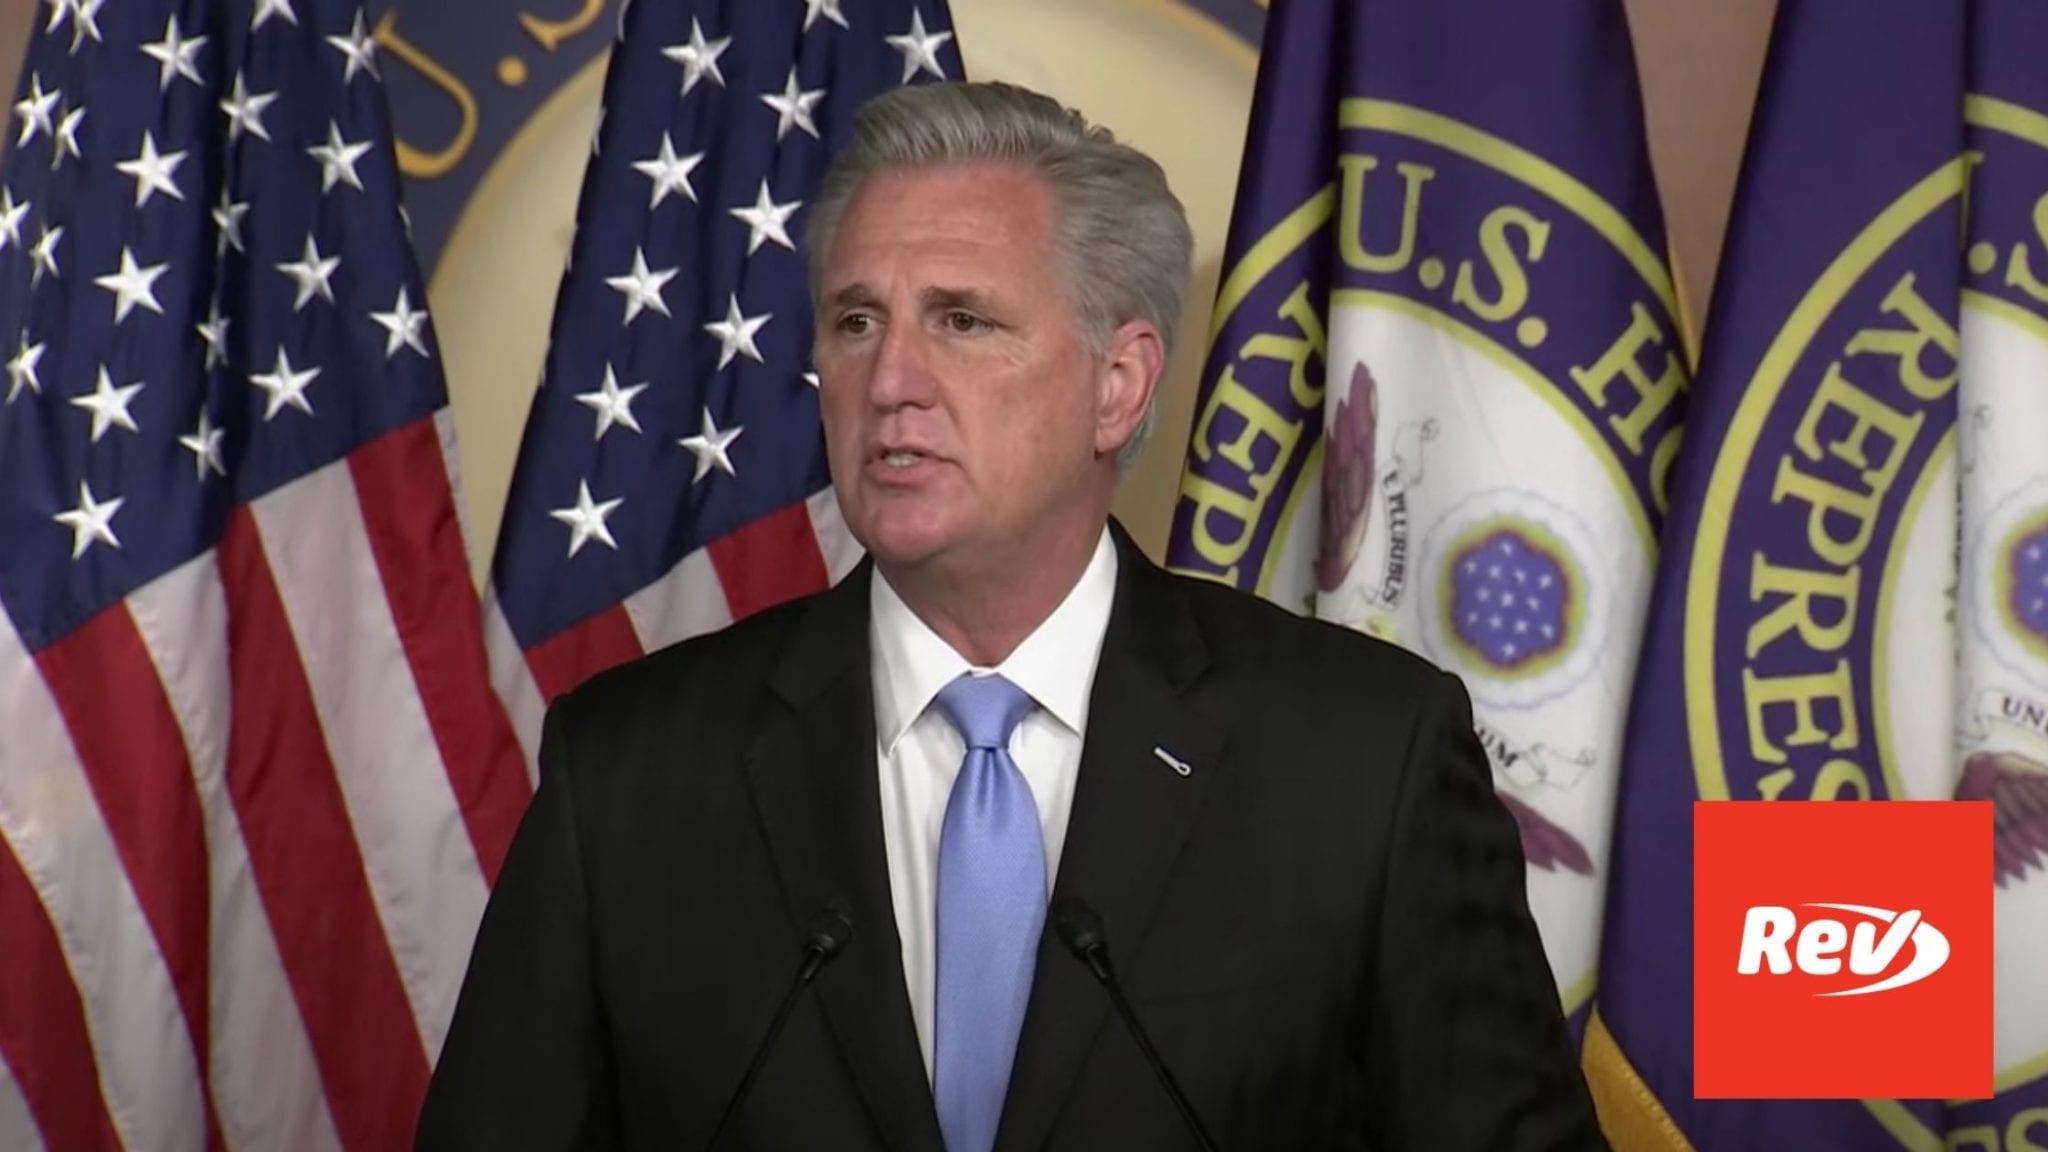 House Minority Leader Kevin McCarthy Press Conference Transcript September 17